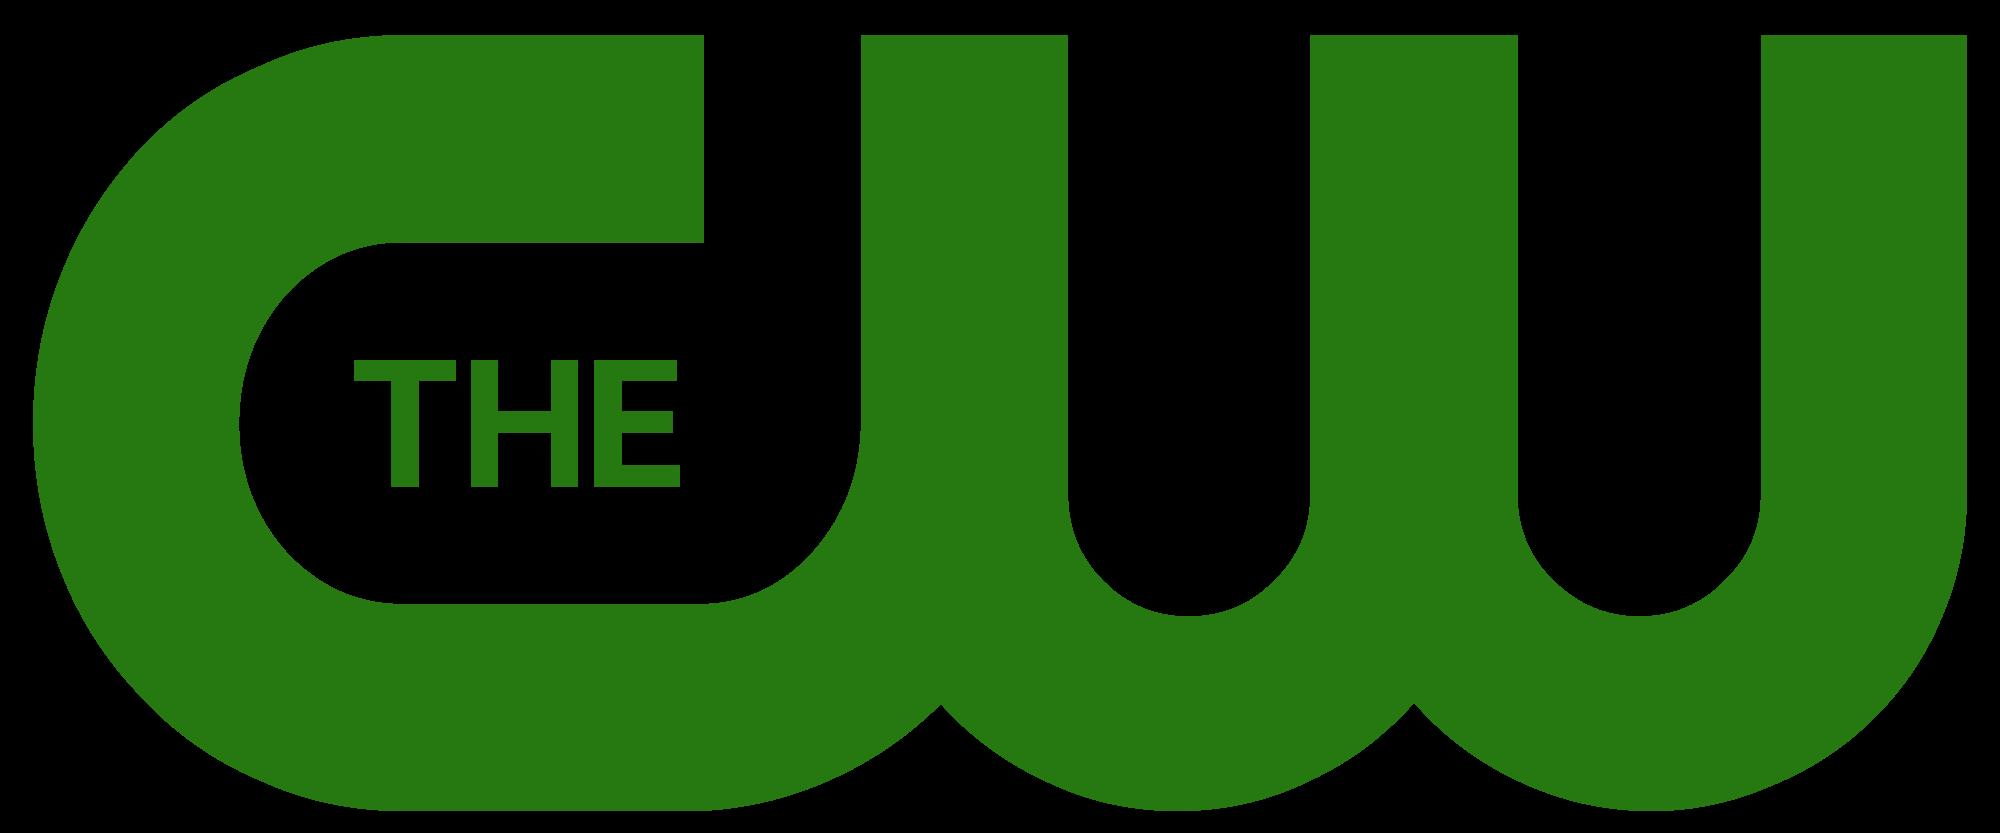 The_CW_Logo